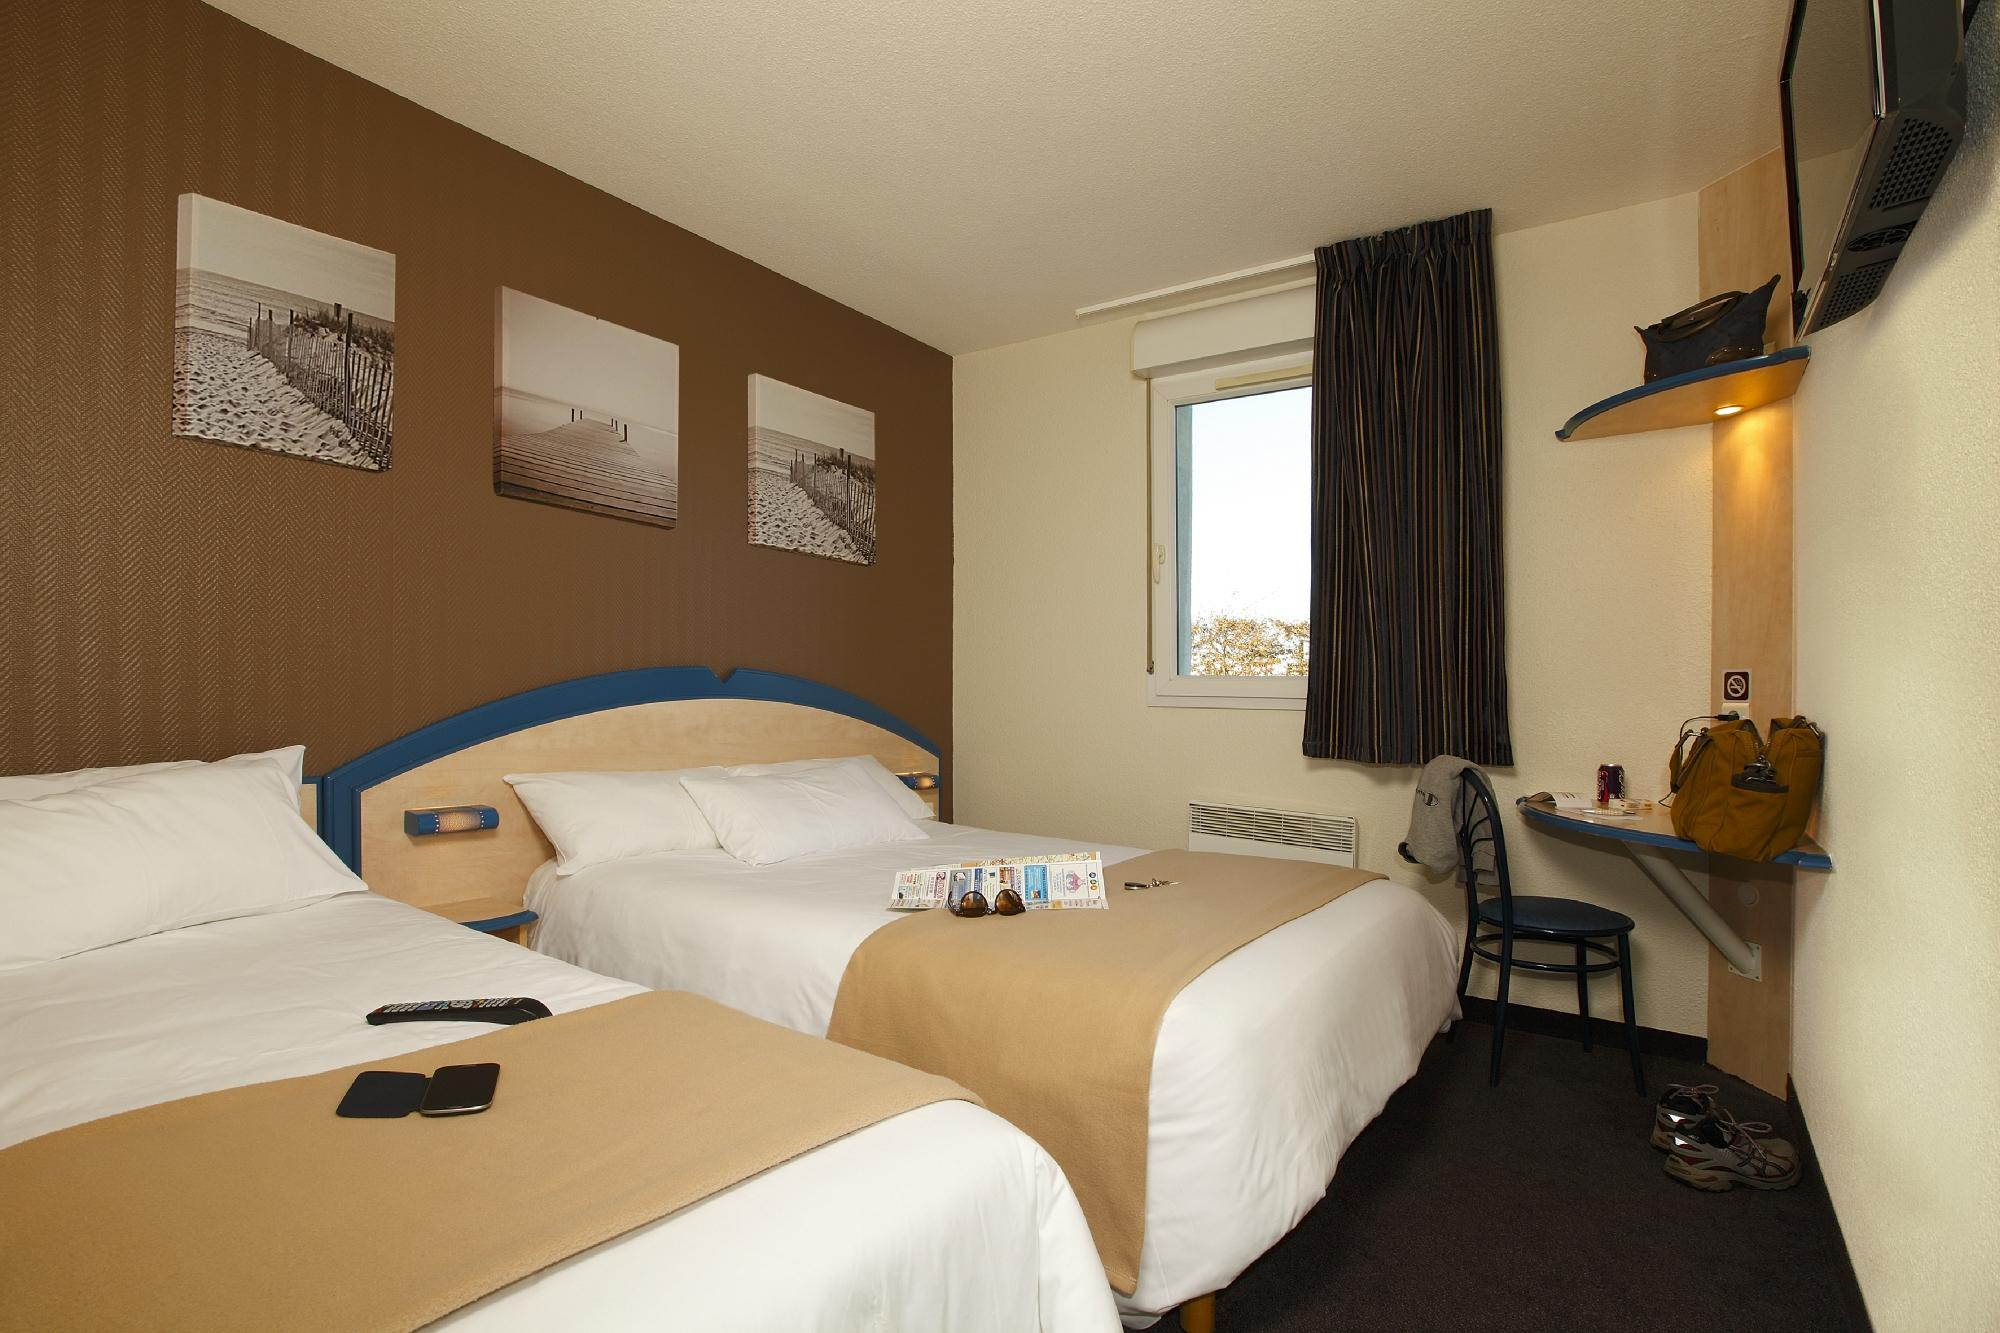 Hotel Athena Friville